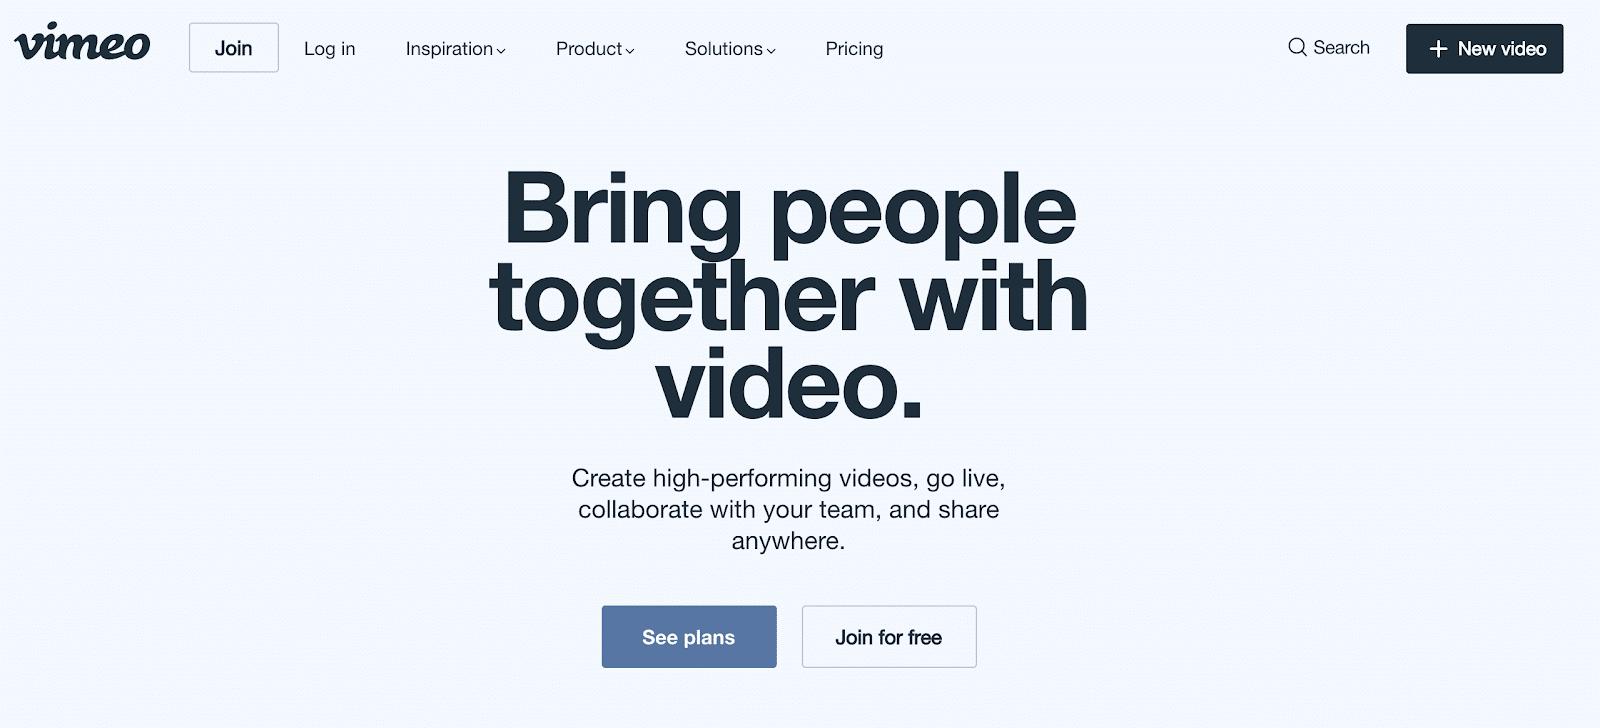 upload videos to vimeo